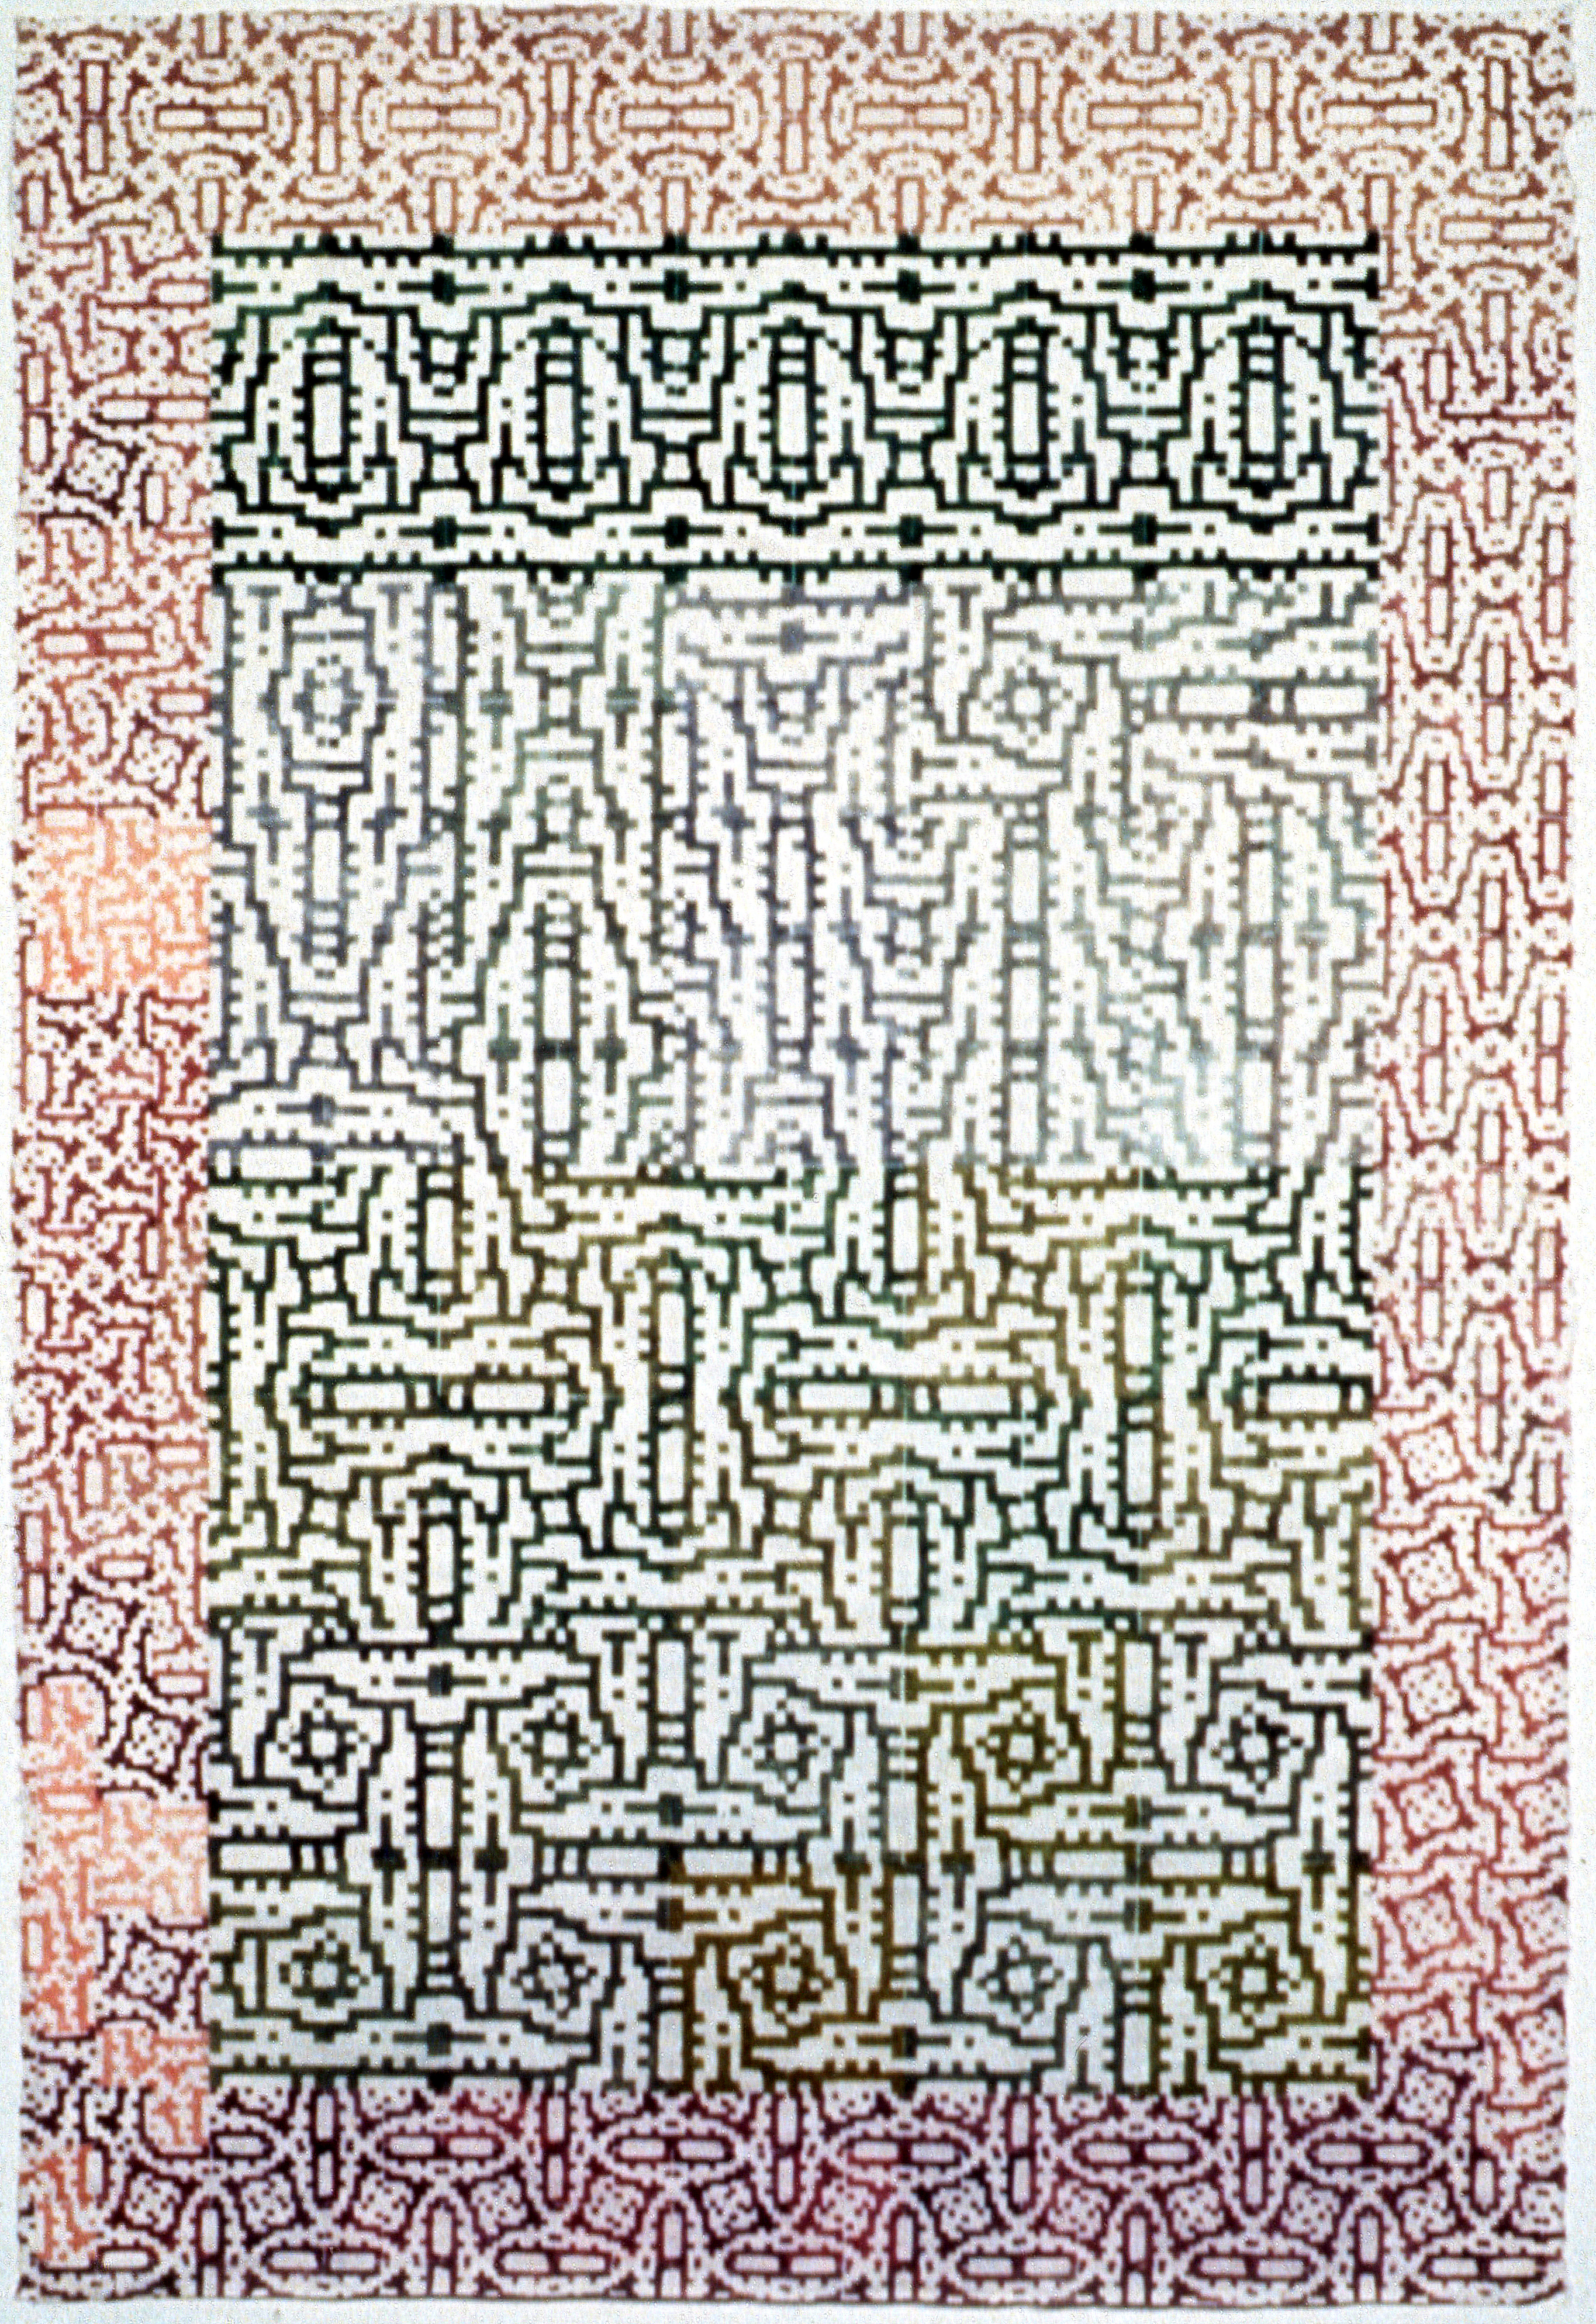 adj 2-28 153257-HRSL-Box 2-028